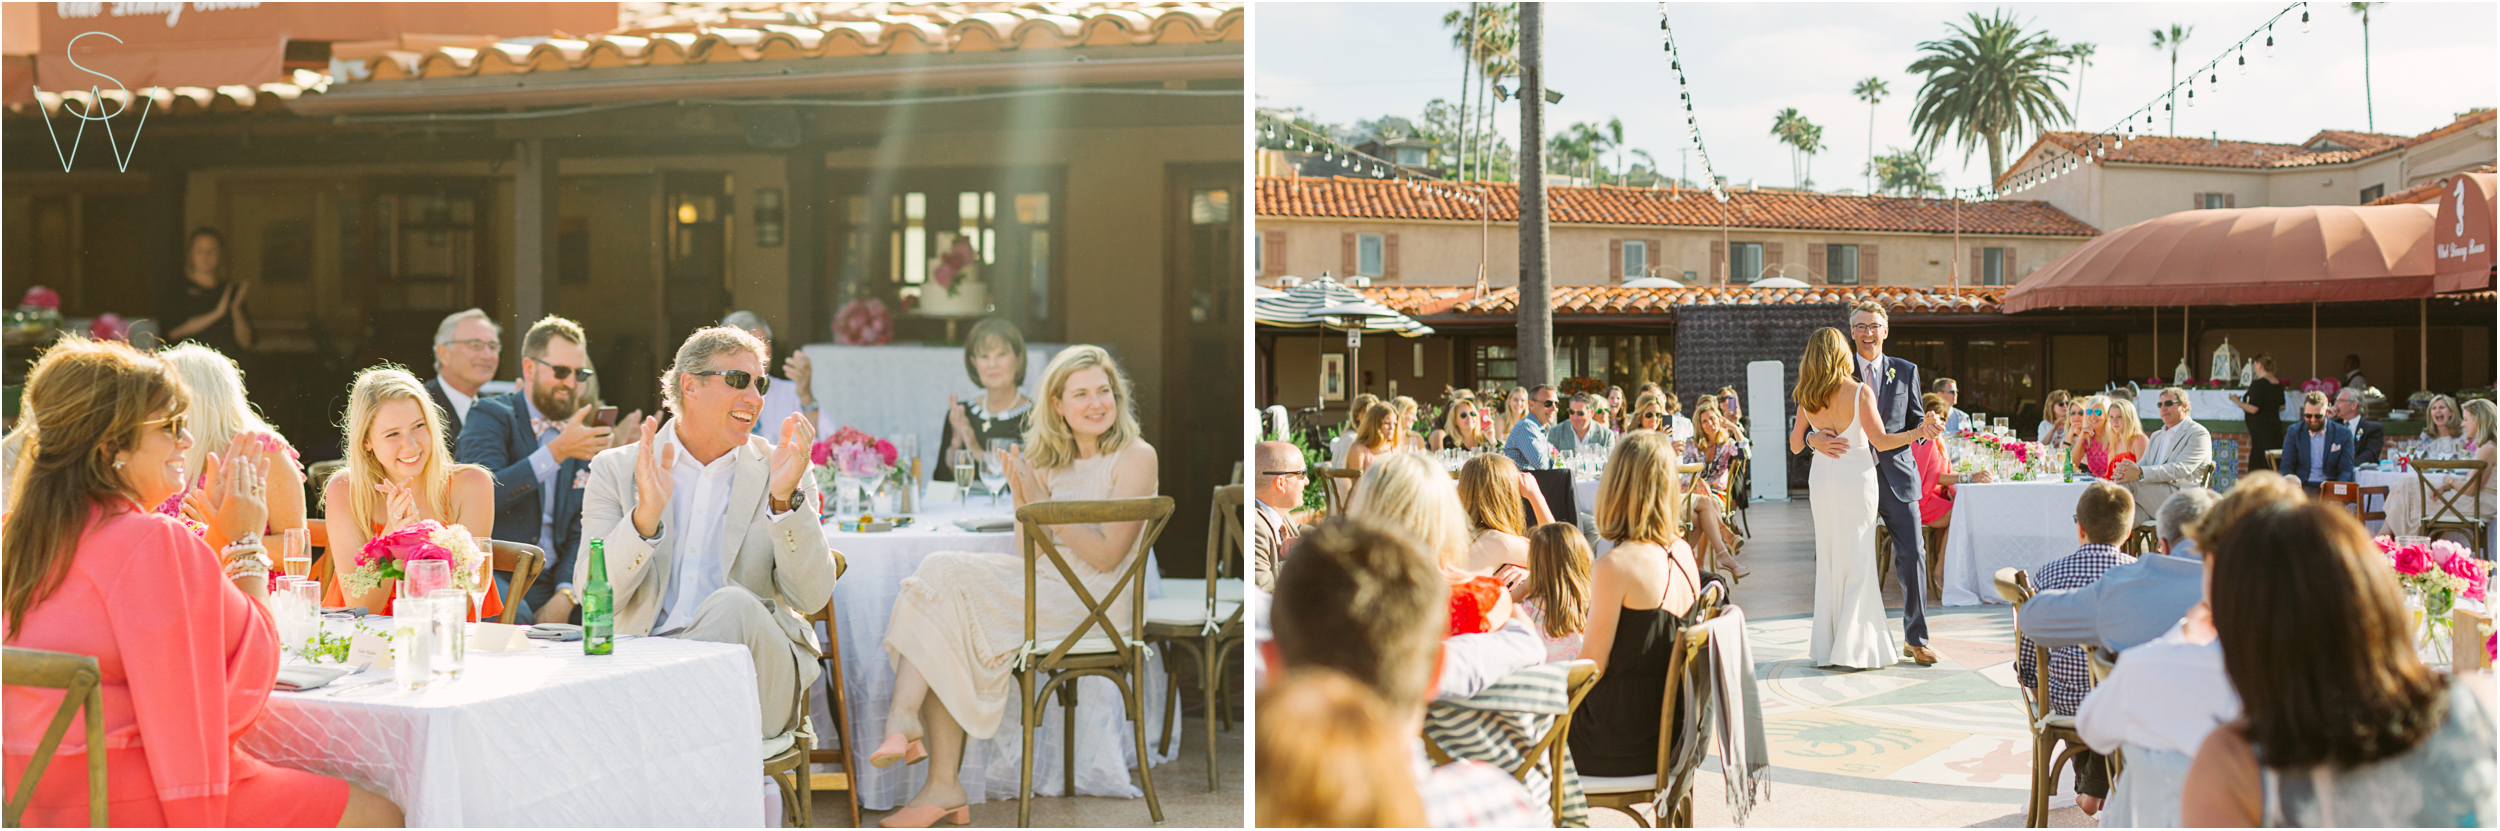 shewanders.wedding.photography.la.jolla-1049.jpg